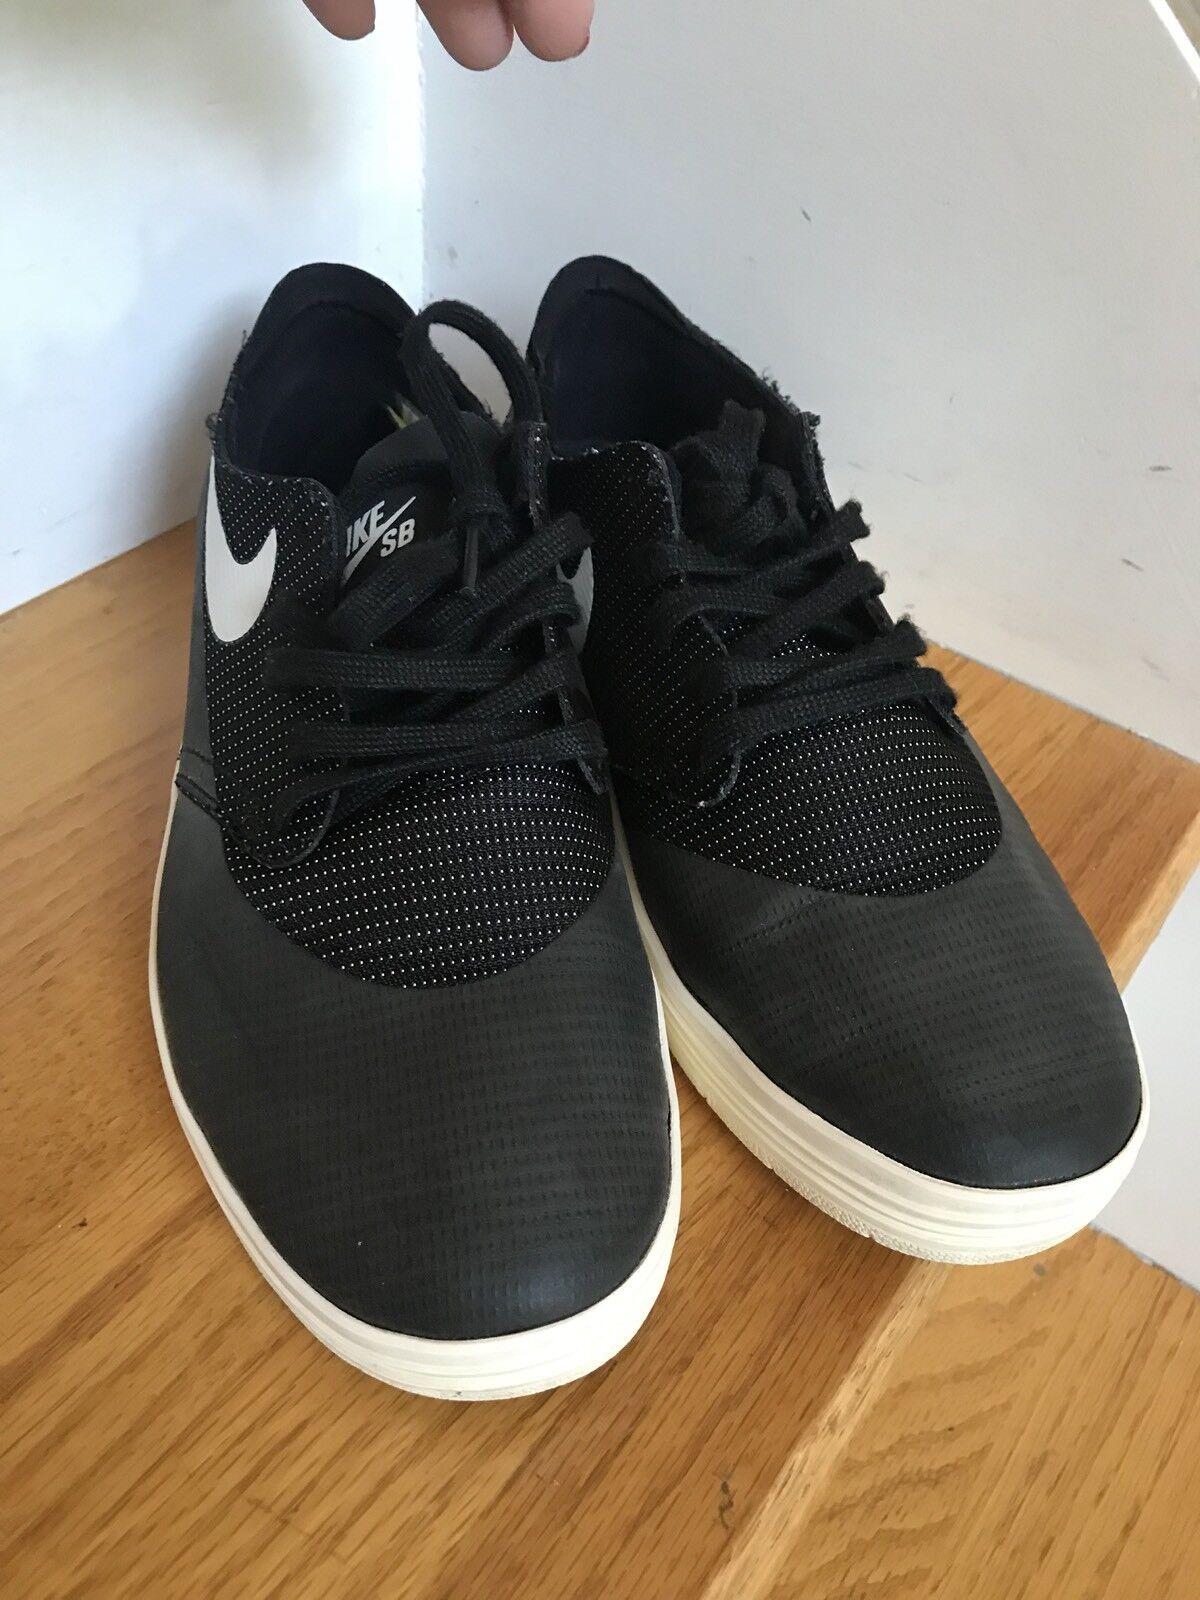 new product 4f60d 174ed ... Mens Nike Lunarlon Shoes 631044-002 Size 6.5M Black Excellent Condition  Condition Condition 7b1844 ...